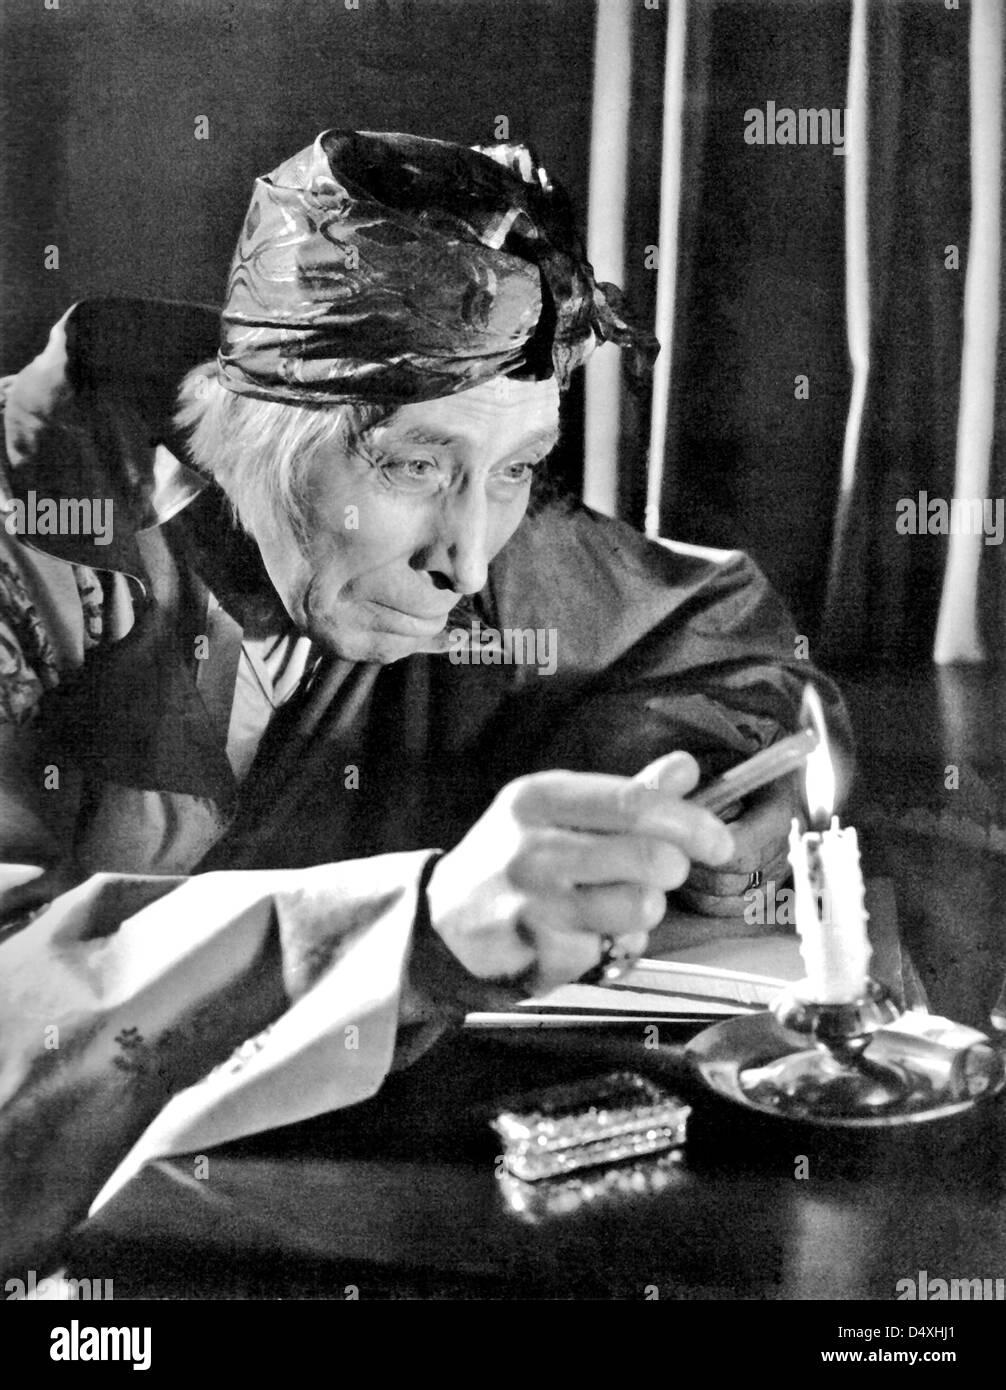 voltaire-1943-warner-bros-film-with-geor